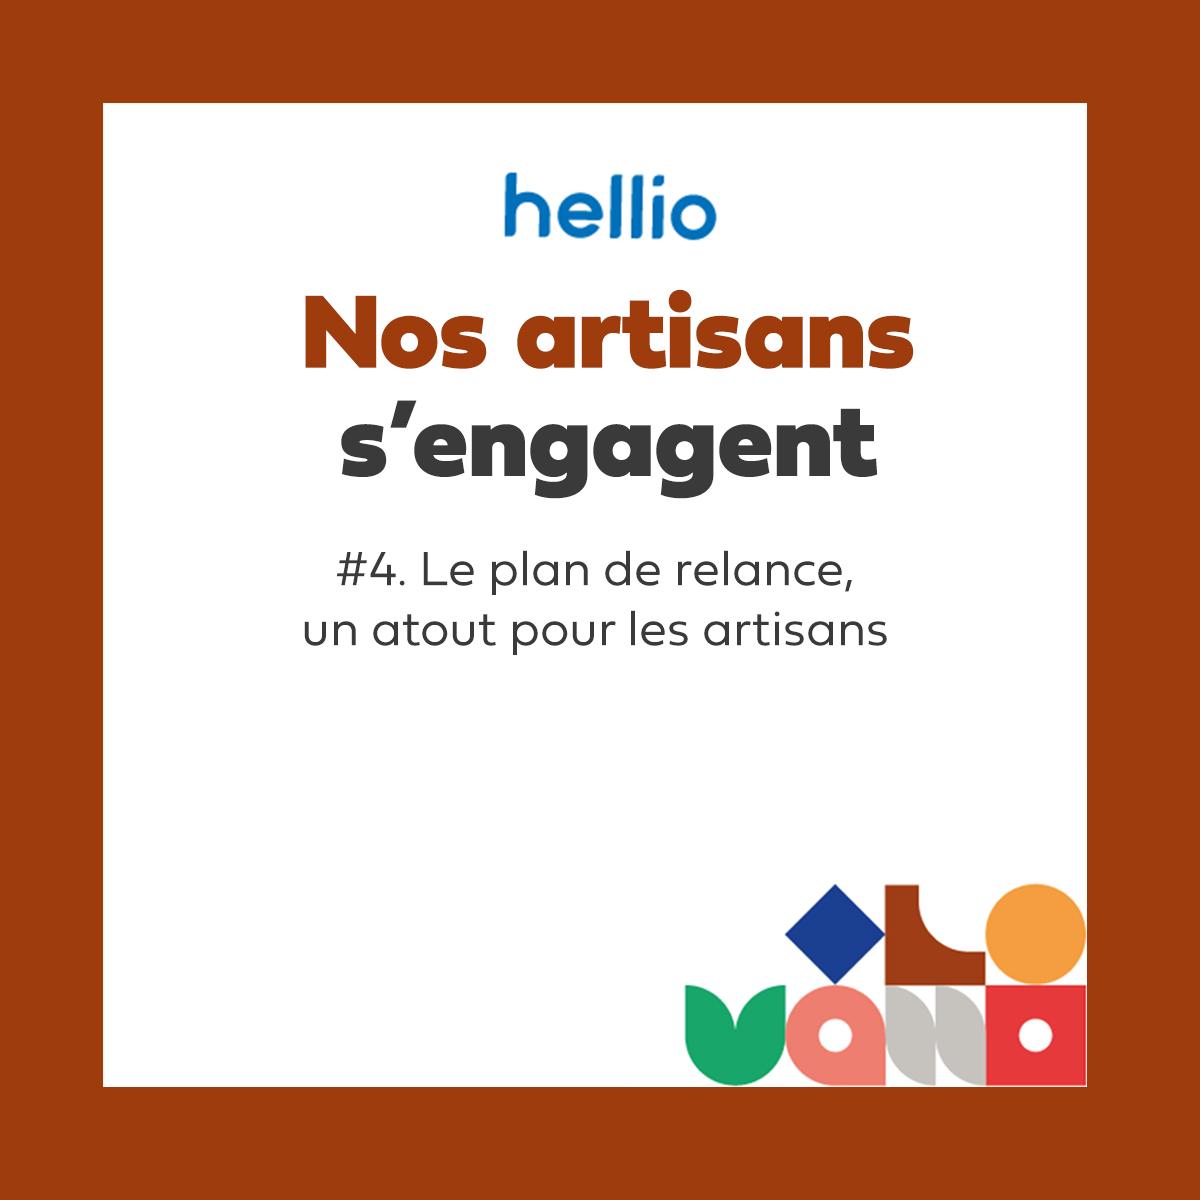 podcast Hellio nos artisans s'engagent plan de relance